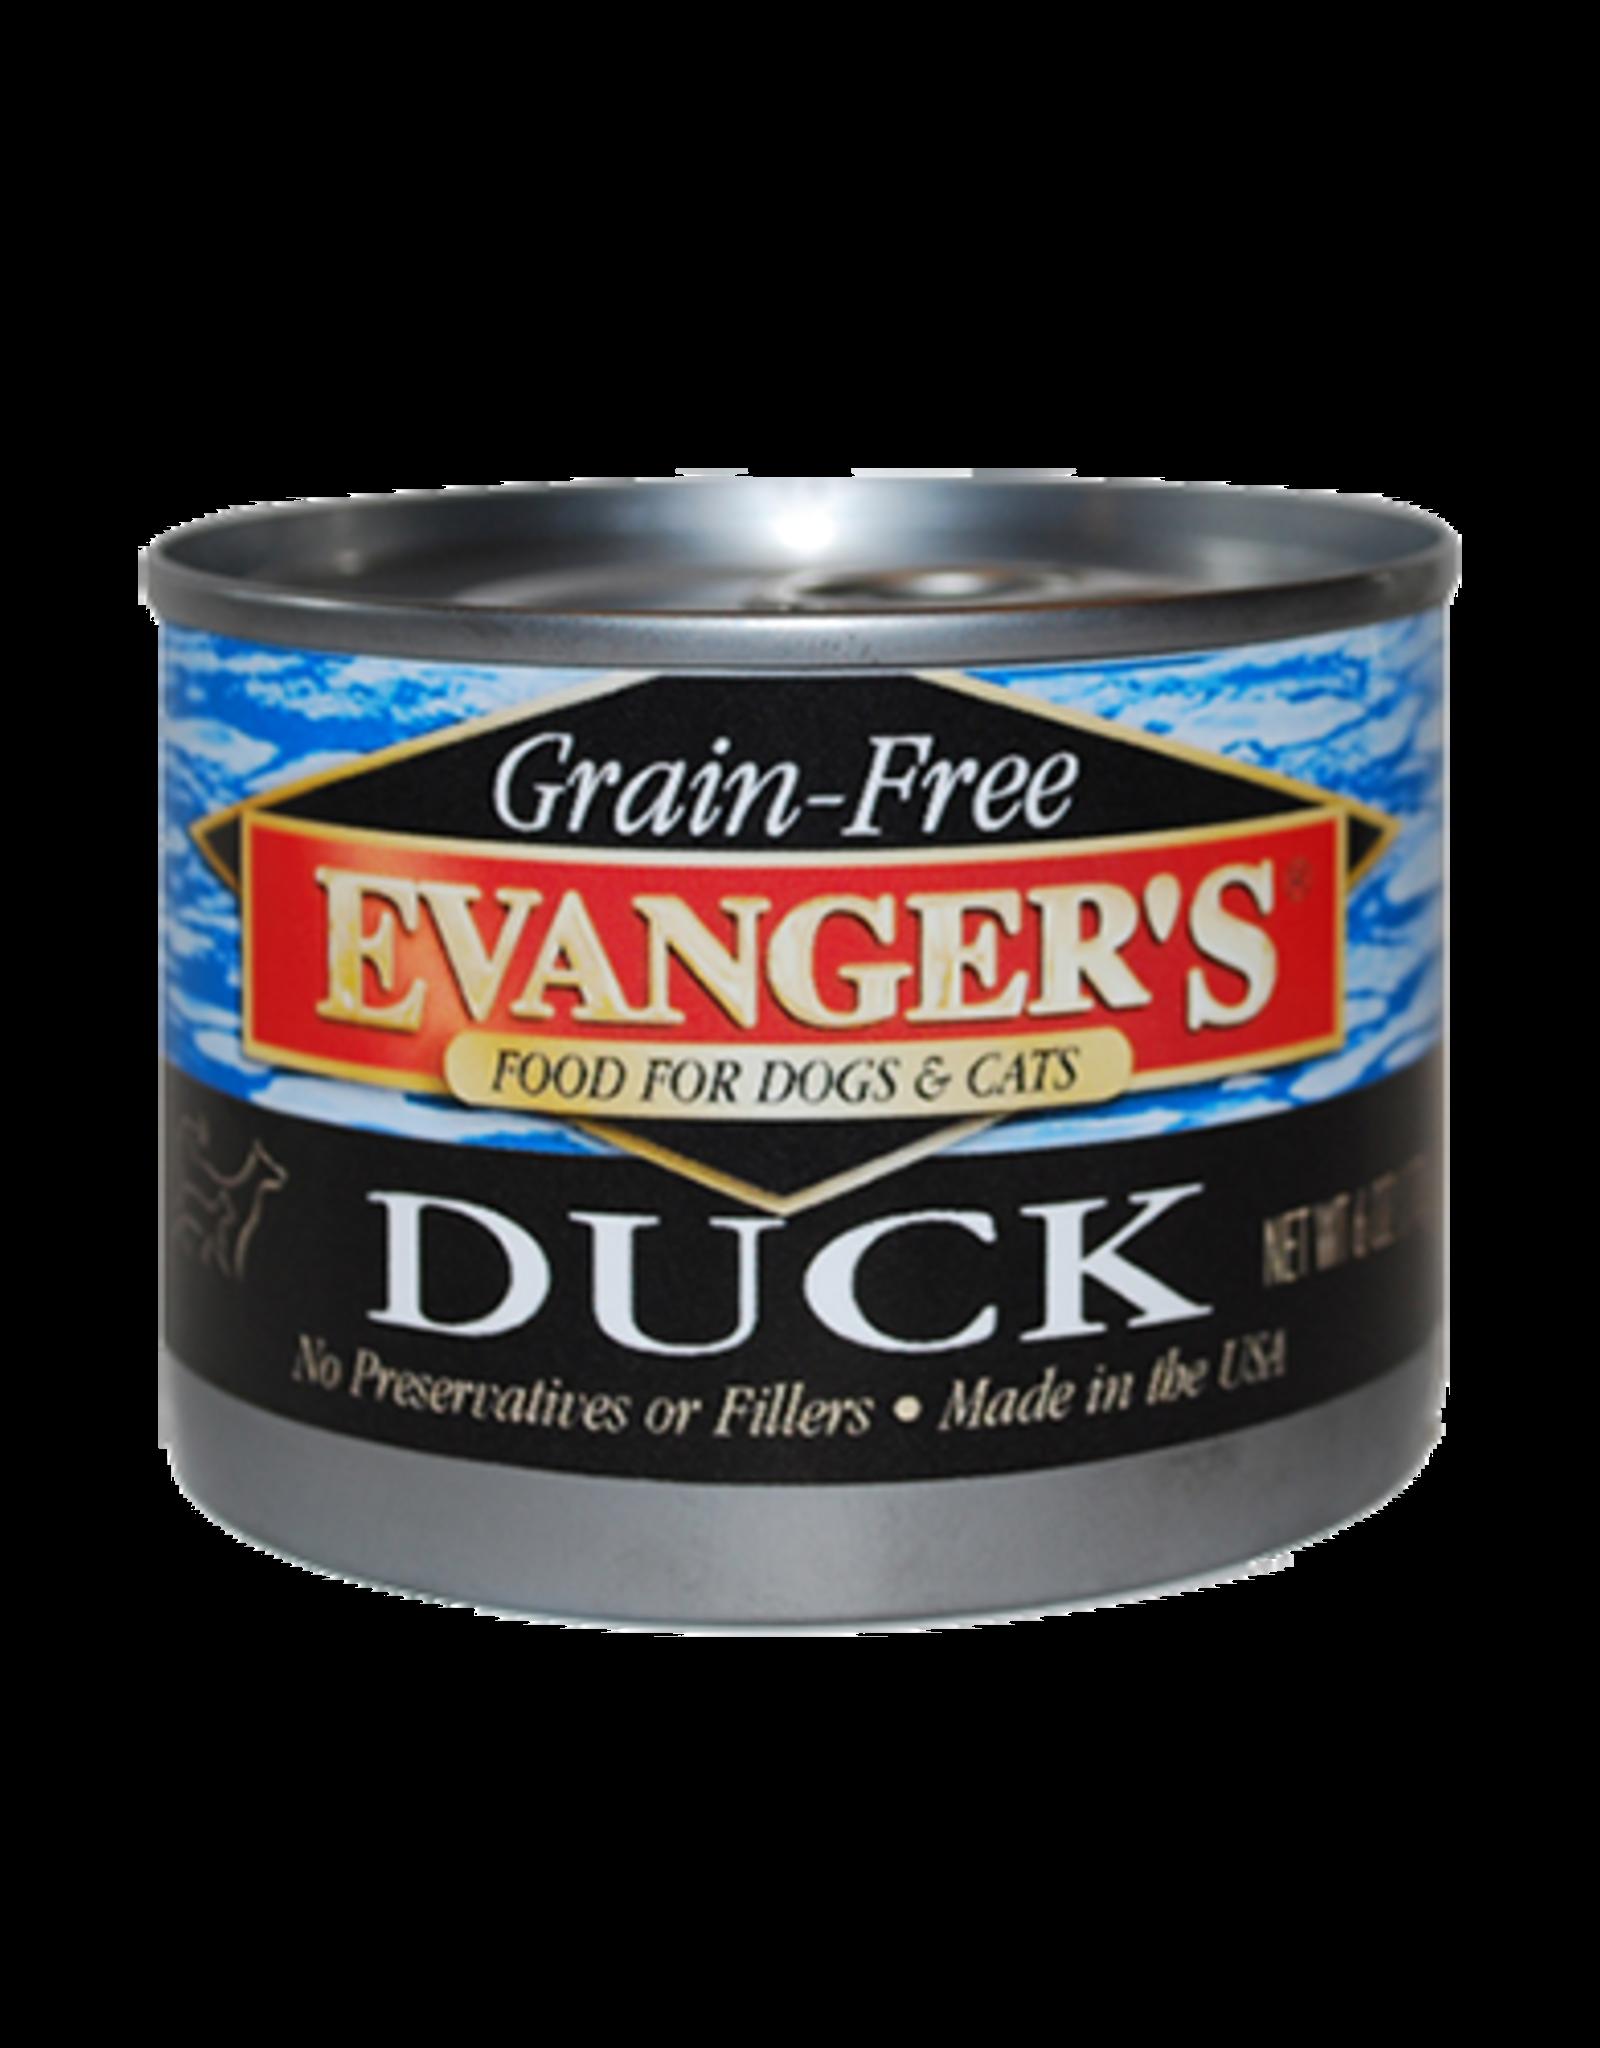 EVANGER'S EVANGERS GRAIN FREE DUCK 6OZ CAN